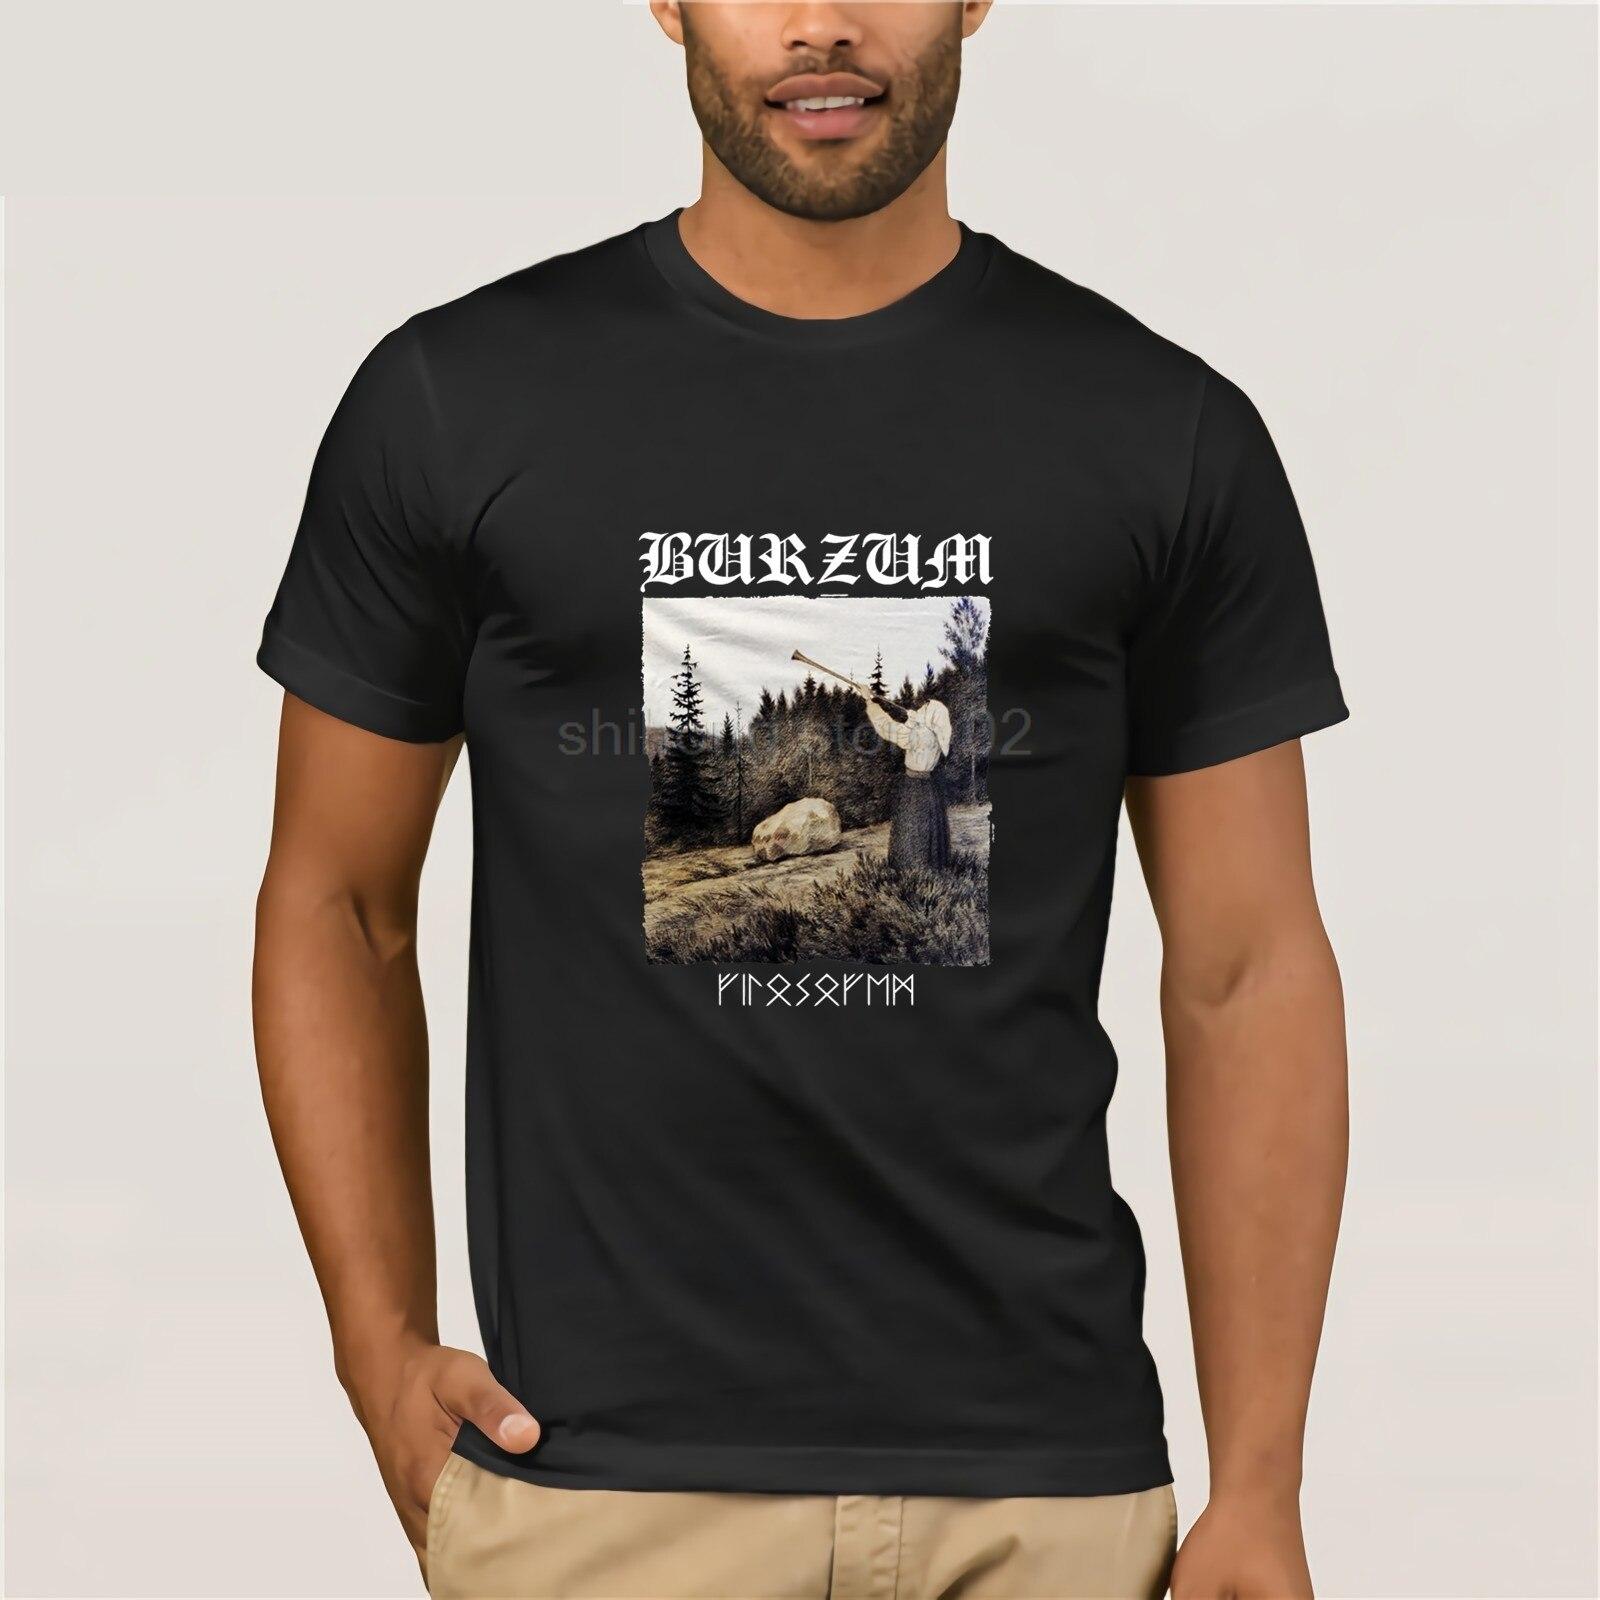 FILOSOFEM BRZM T SHIRT Black Metal Mayhem Darkthrone Bathory Emperor Mens Tops Cool O Neck T-Shirt Top Tee Plus Size